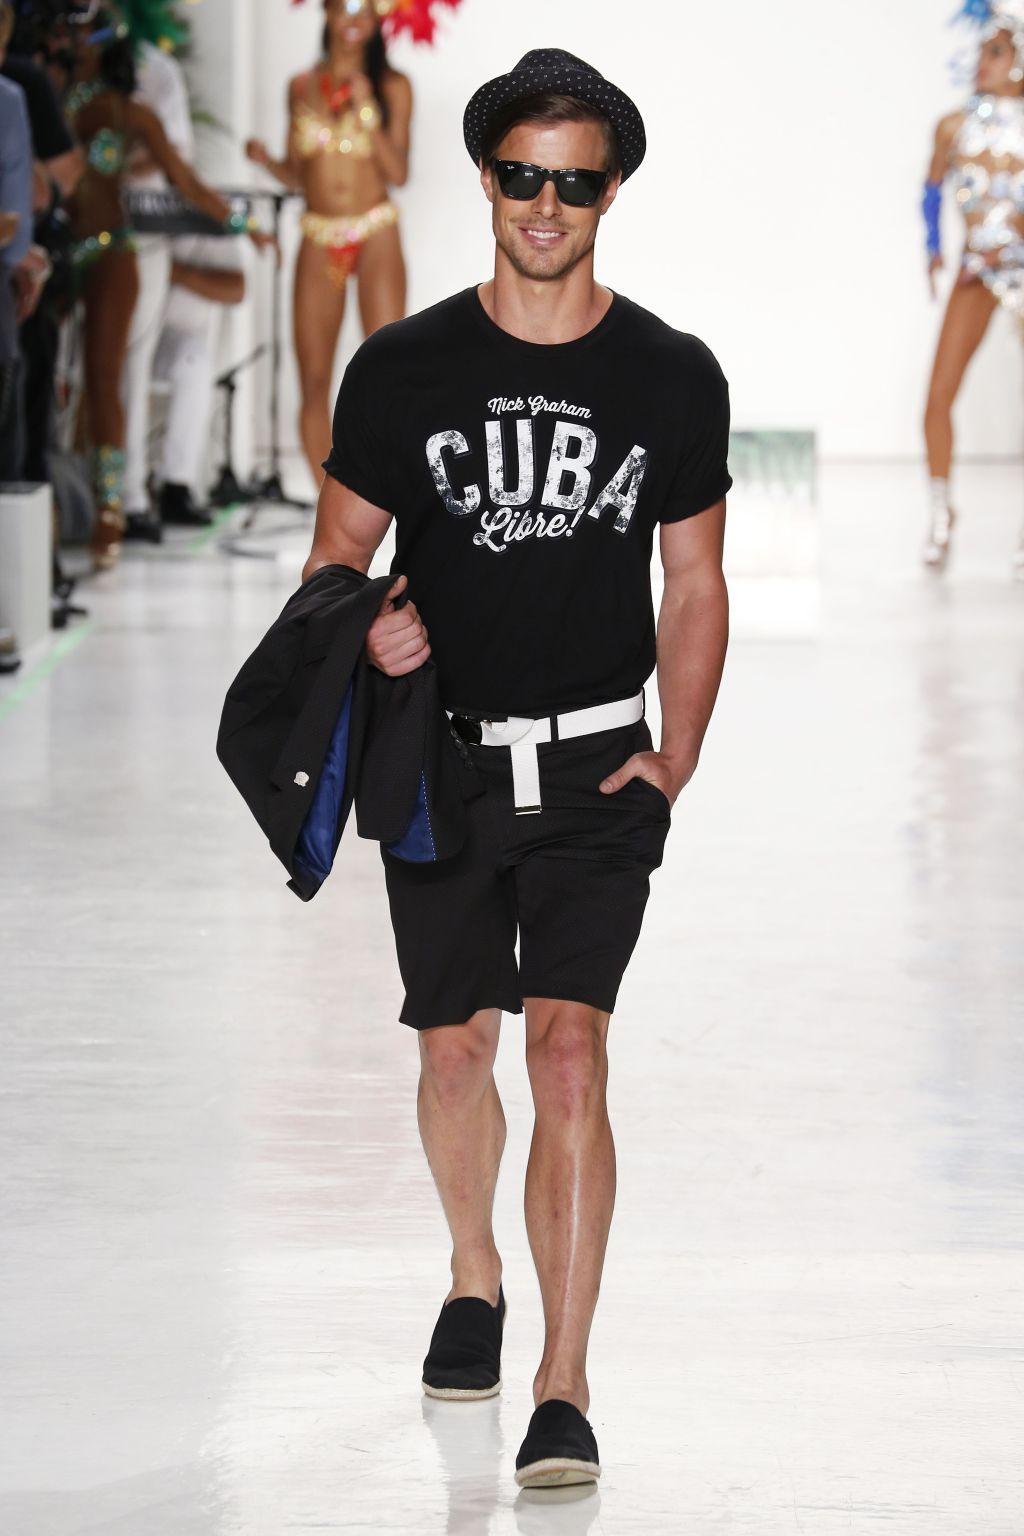 Man in cuba shirt